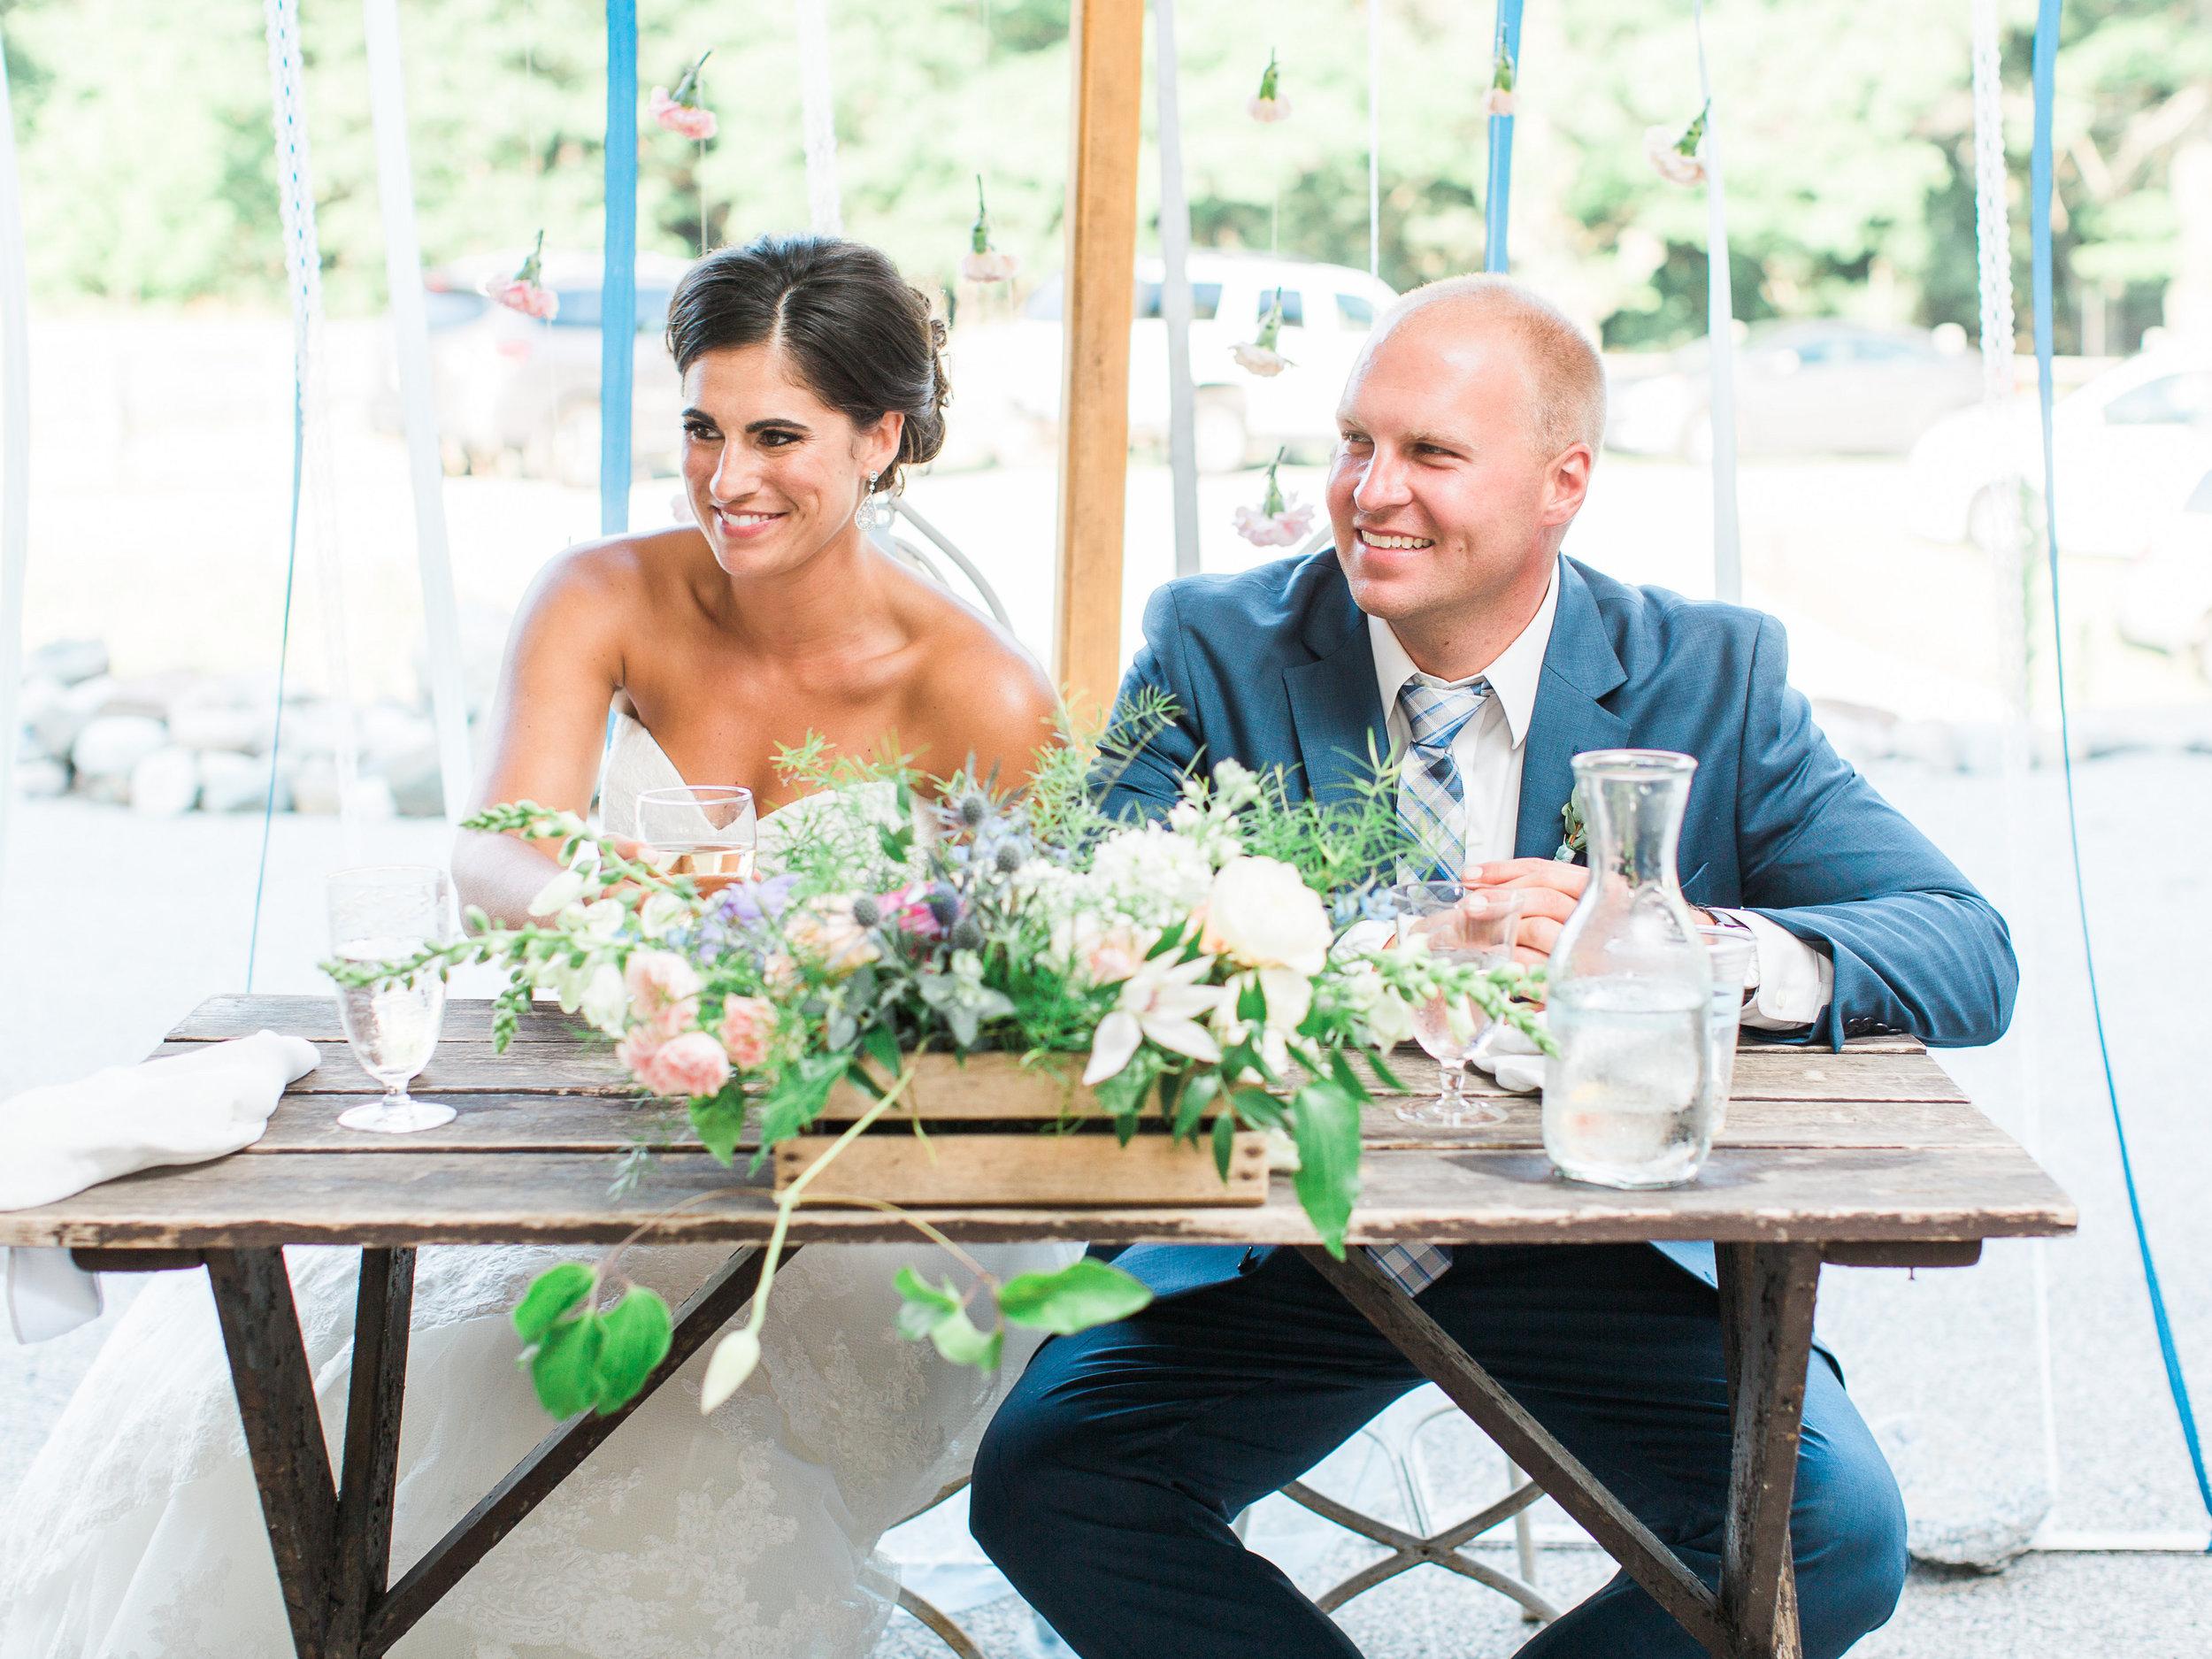 ERIC AND HALLIE WEDDING-HI RESOLUTION FOR PRINTING-0930.jpg